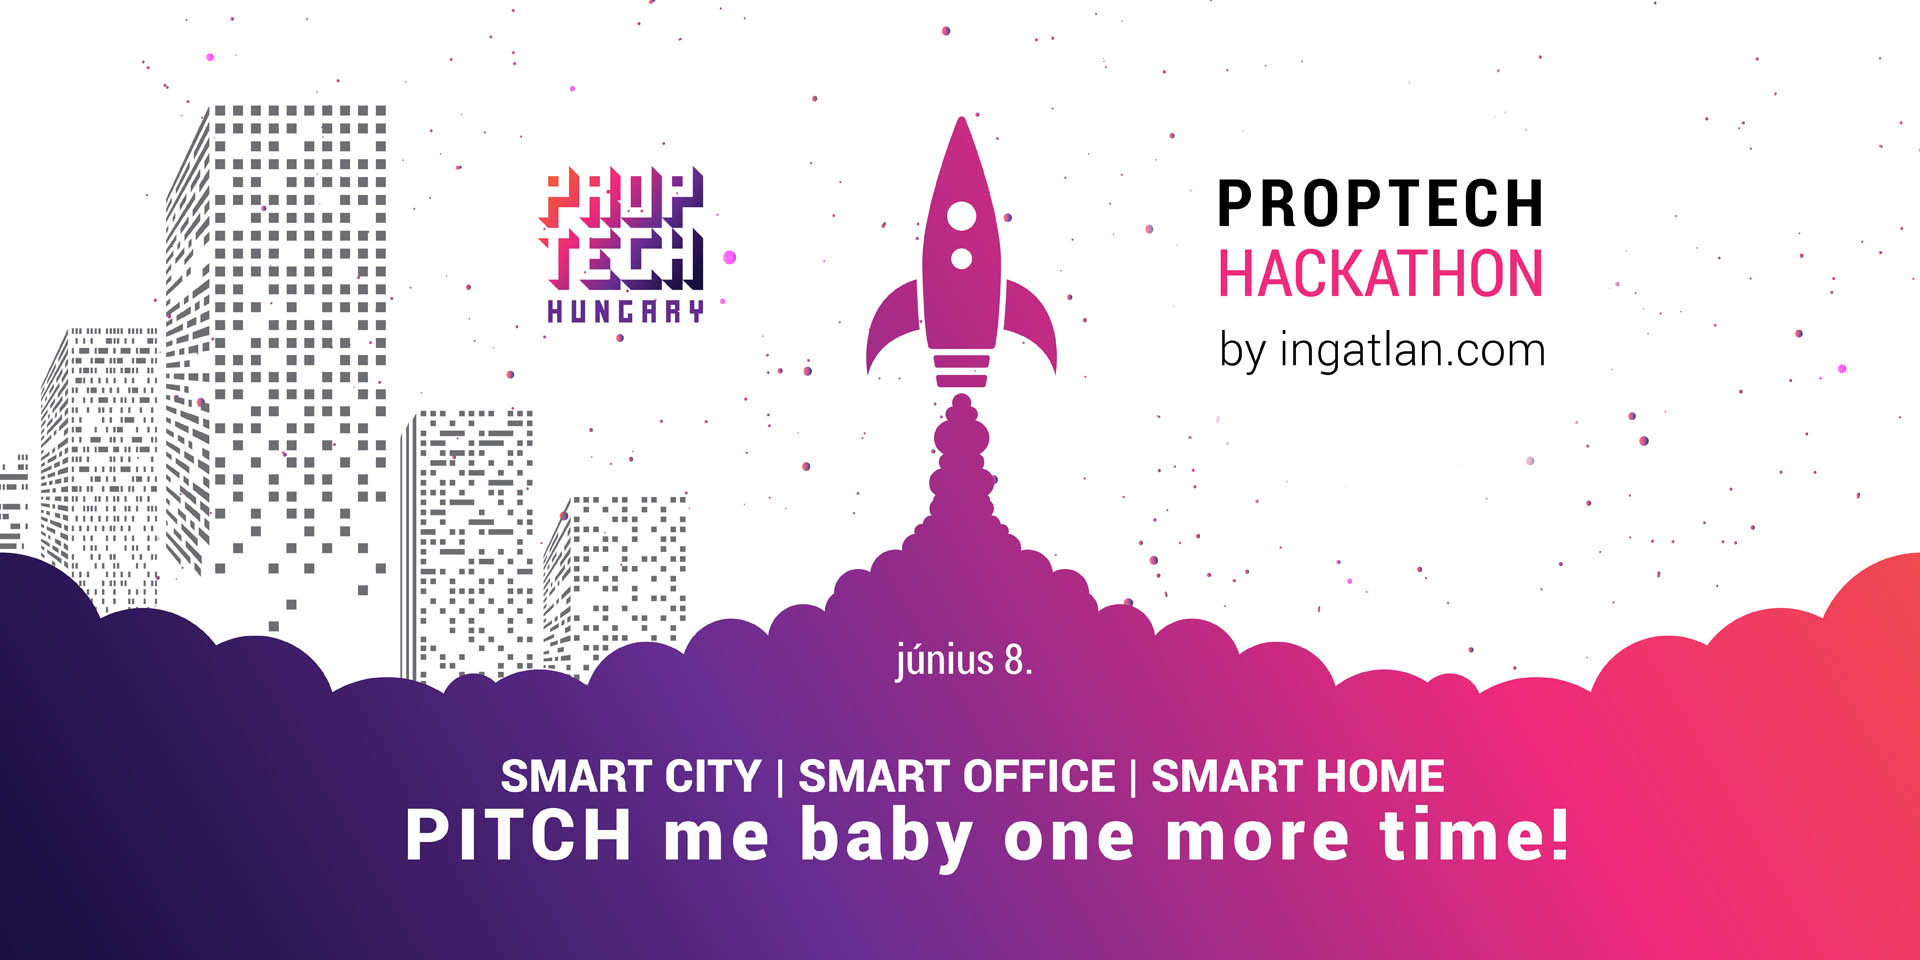 proptechhackathon